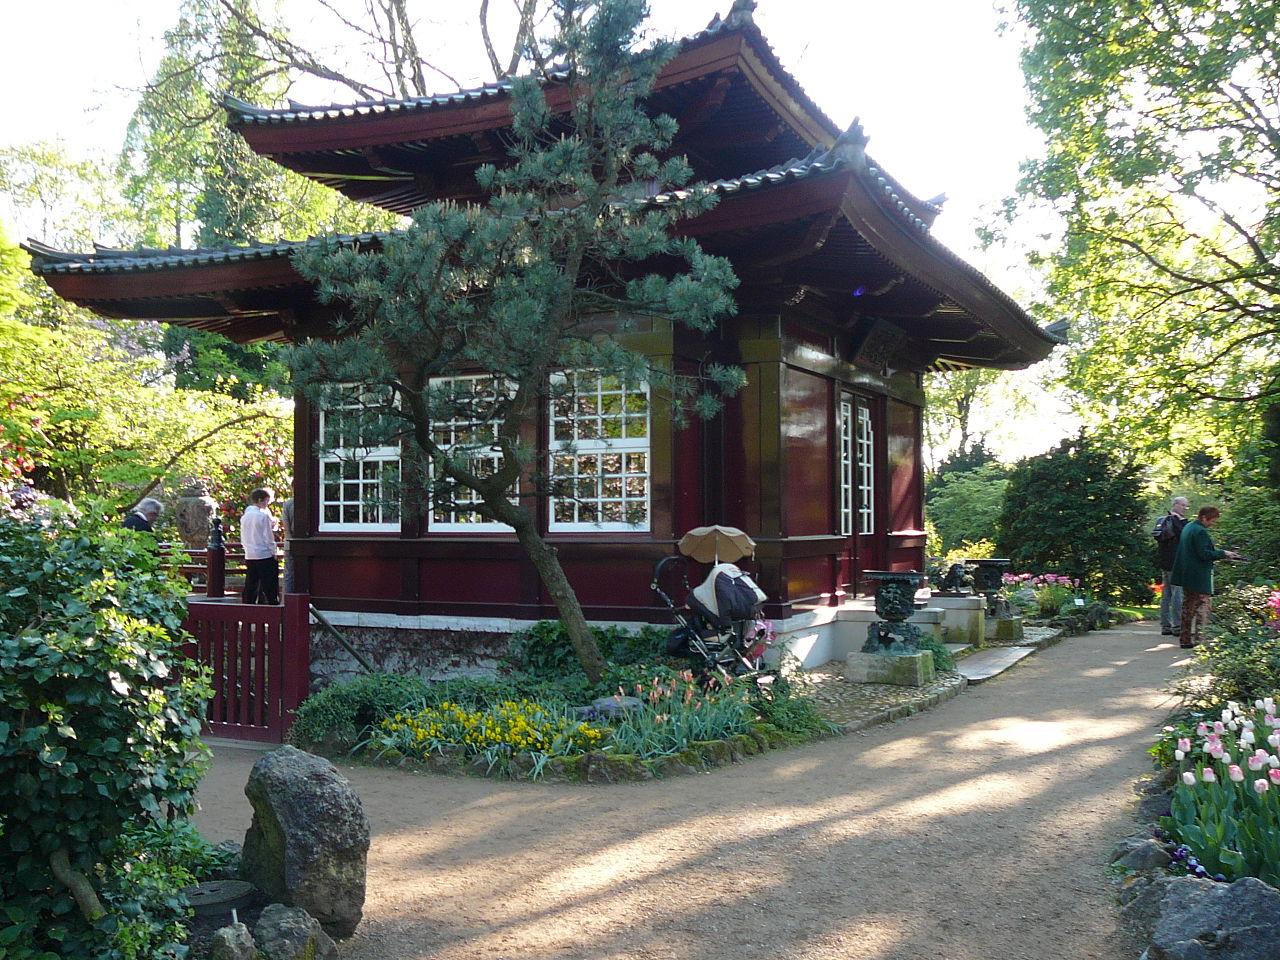 Bild Japanischer Garten Leverkusen